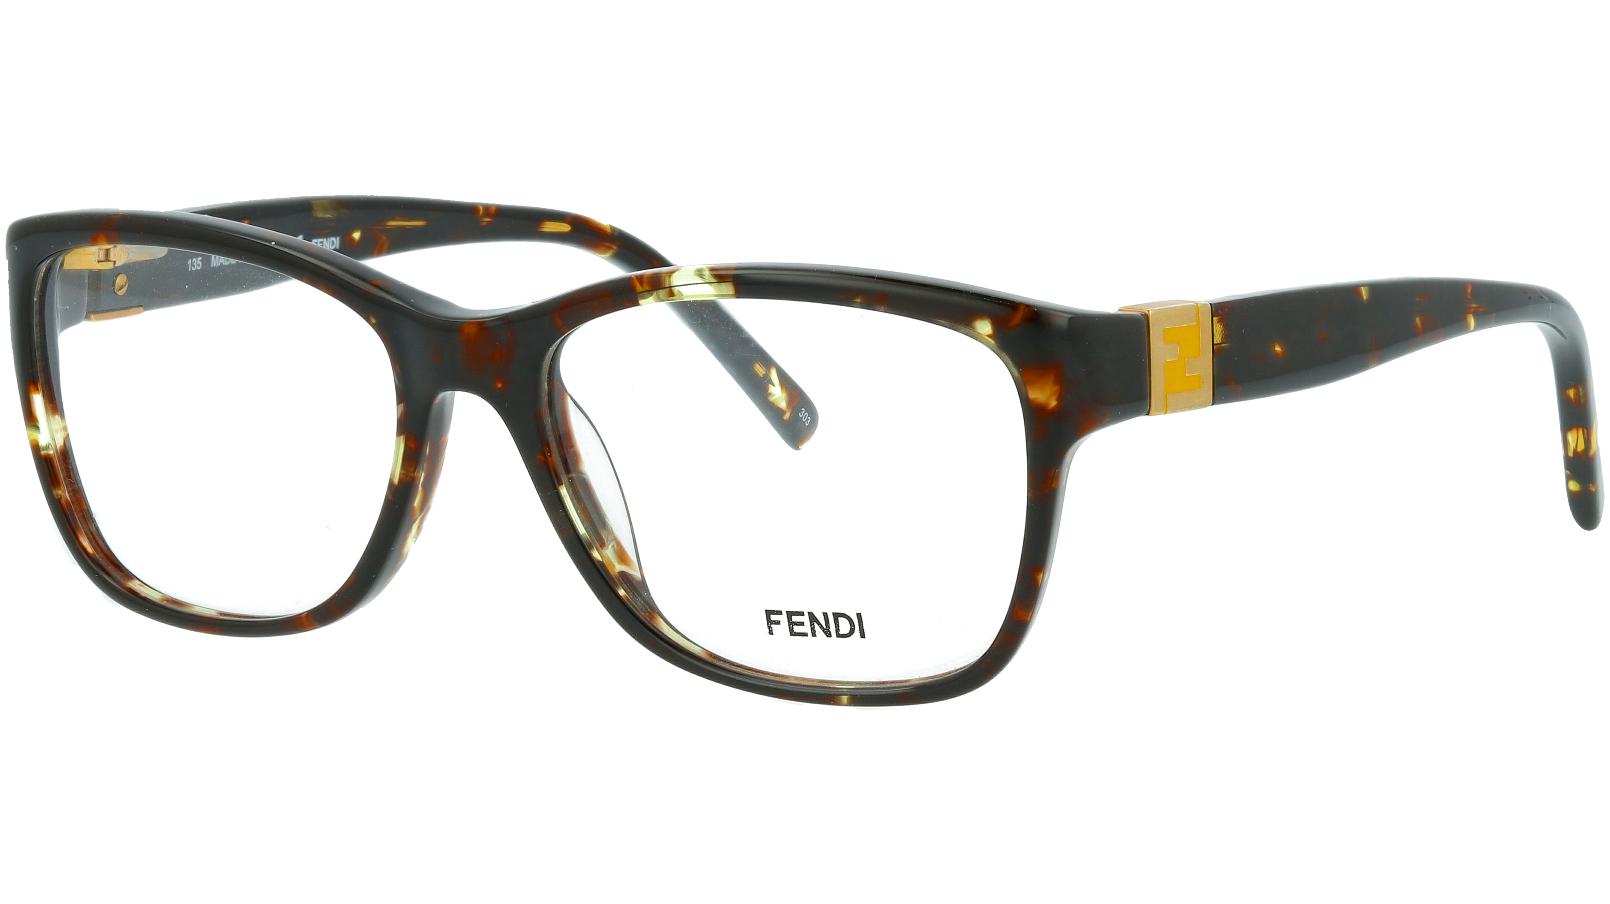 Fendi F1011 214 51 HAVANA Glasses